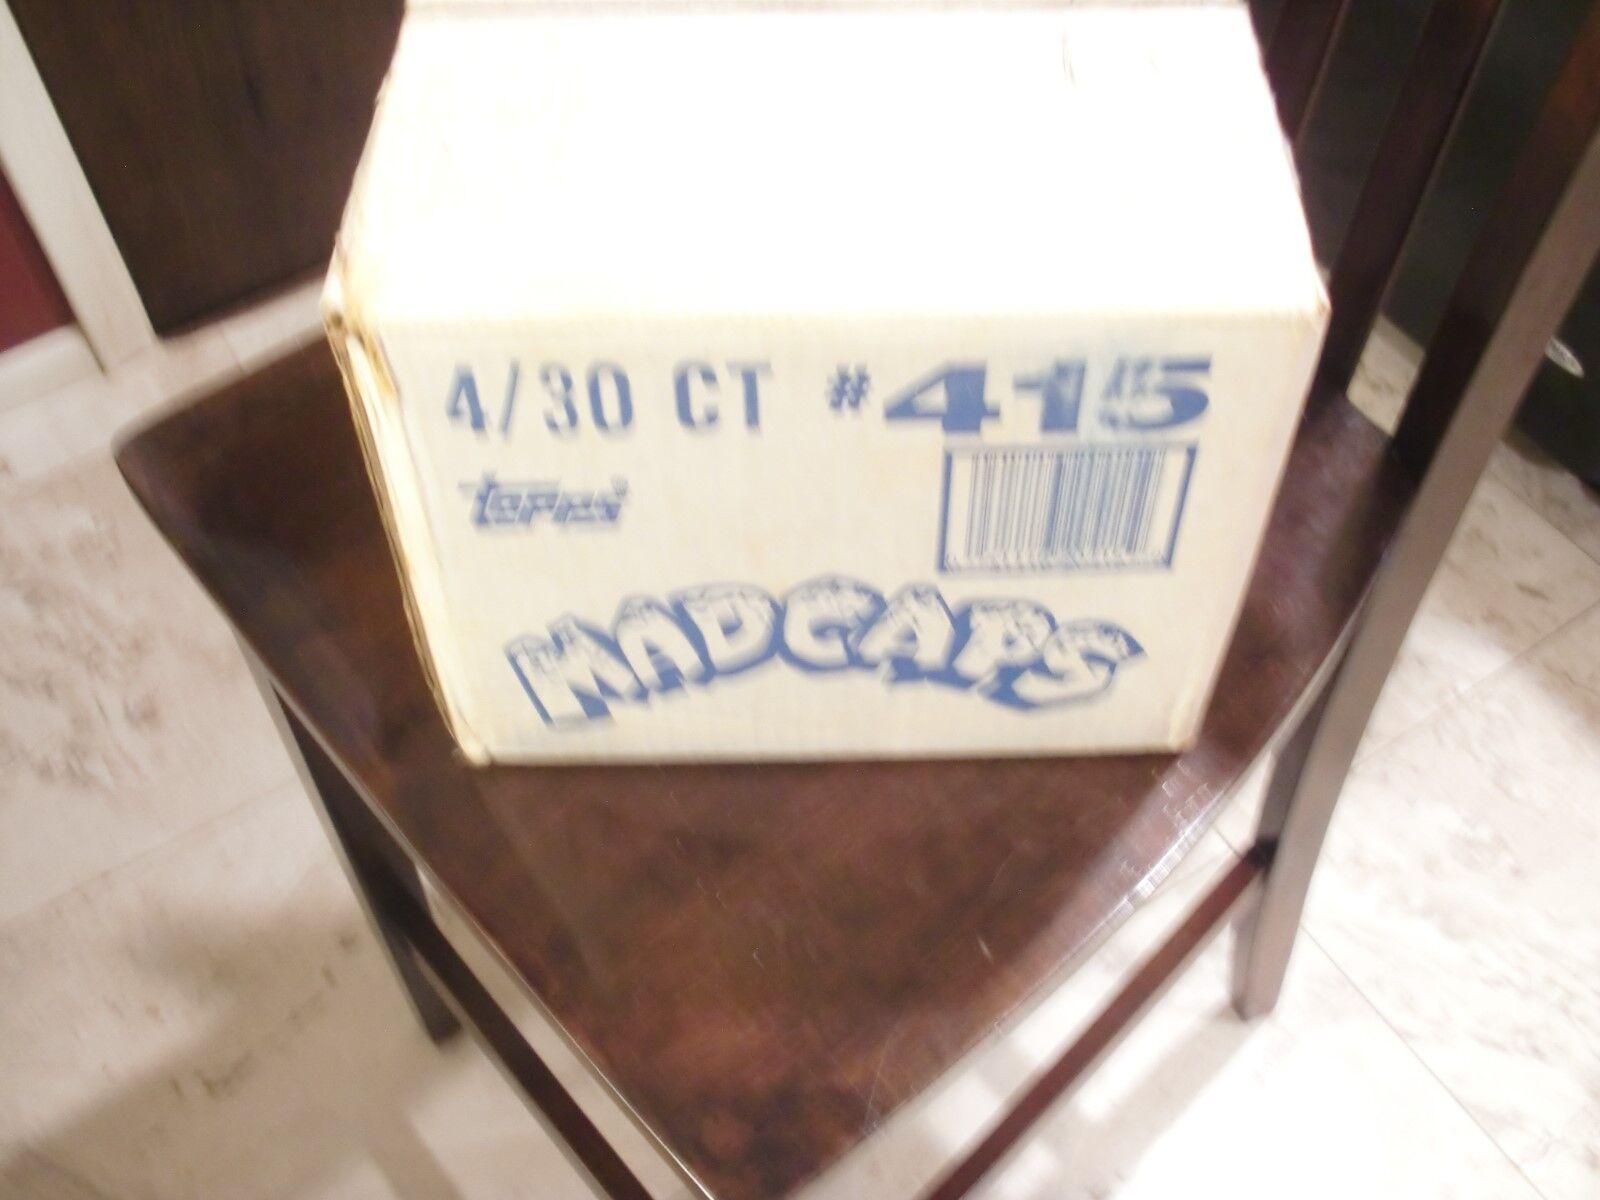 Tazos Milkcaps 1994 Topps Mad caps (Wacky Caps) caso de (4) Cajas Super Raro